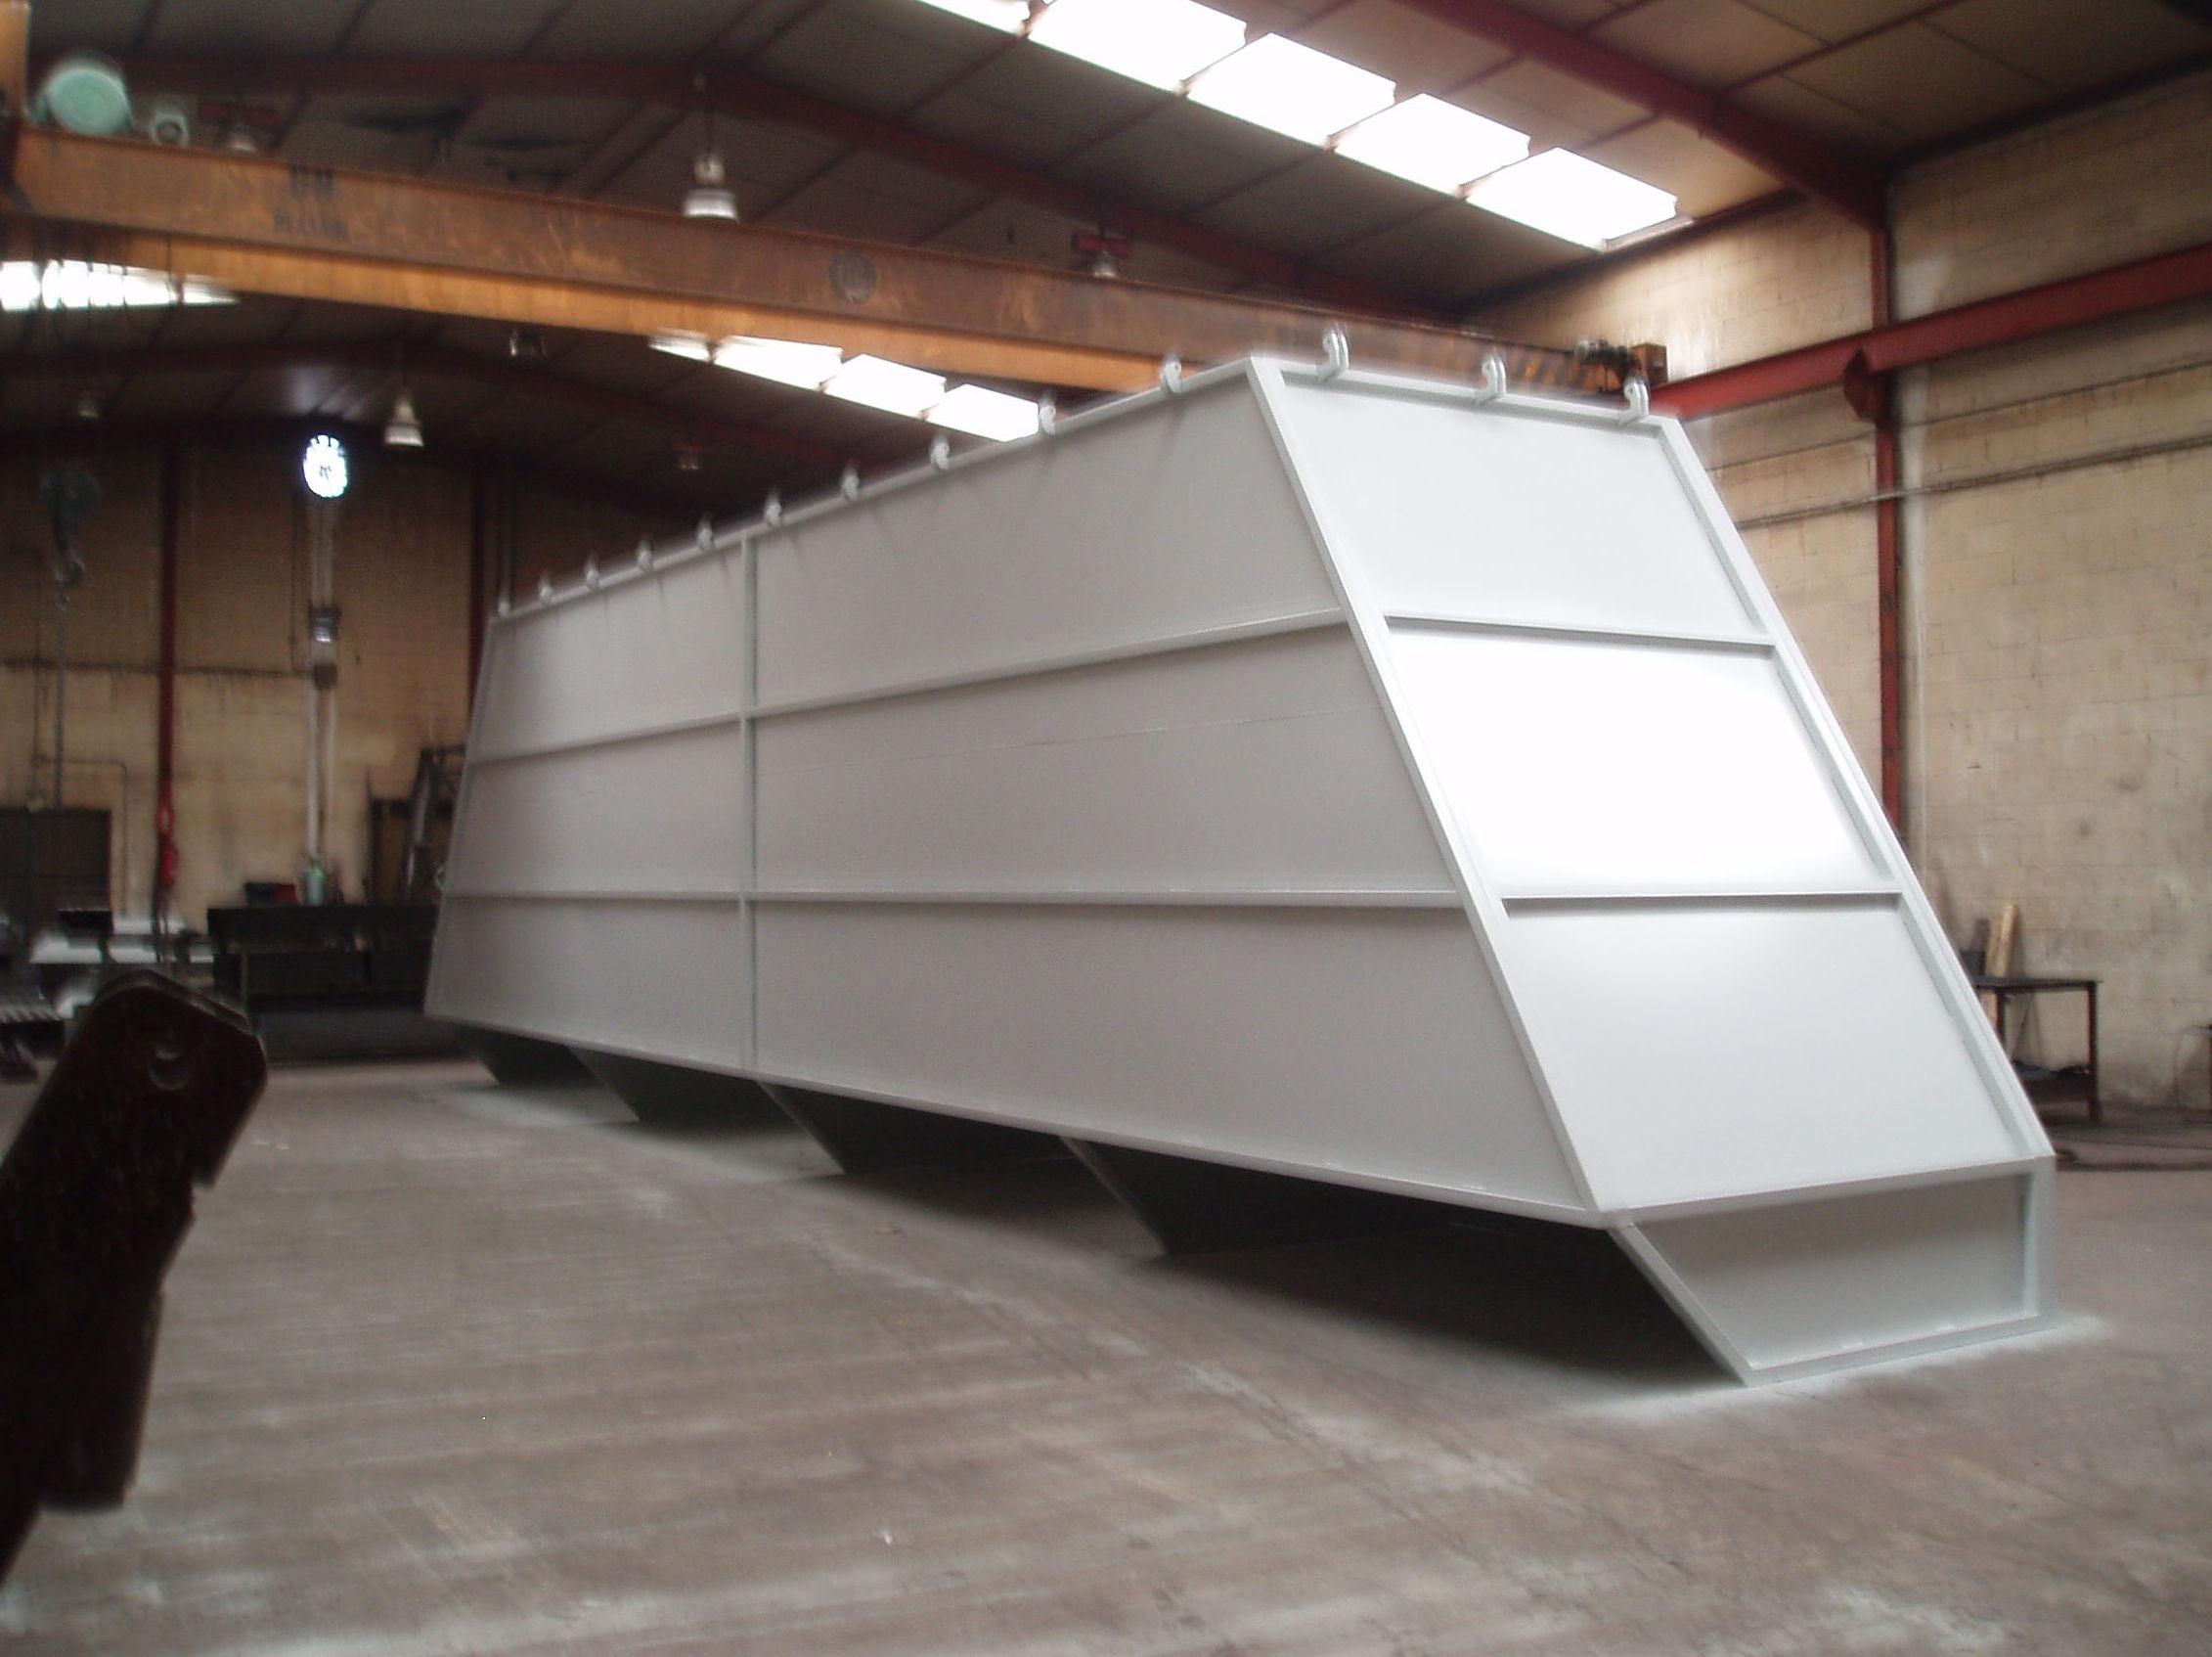 Fabricación de estructuras metálicas en Zaragoza